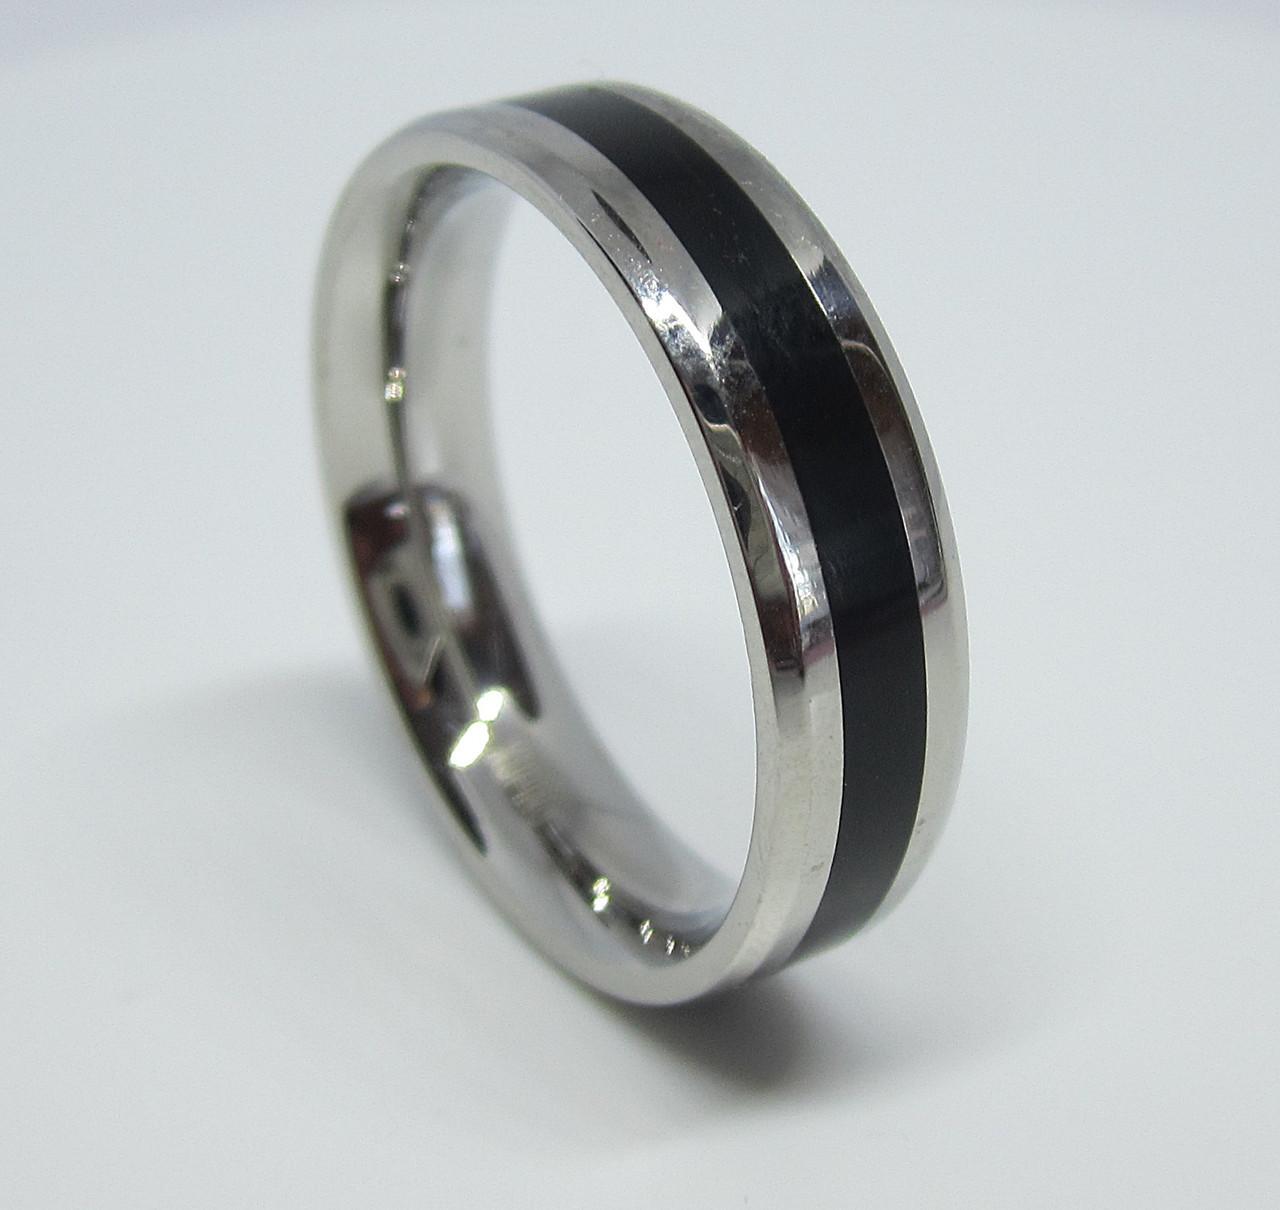 Кольцо XP Унисекс эмаль, размер 19, 20, 21, 22